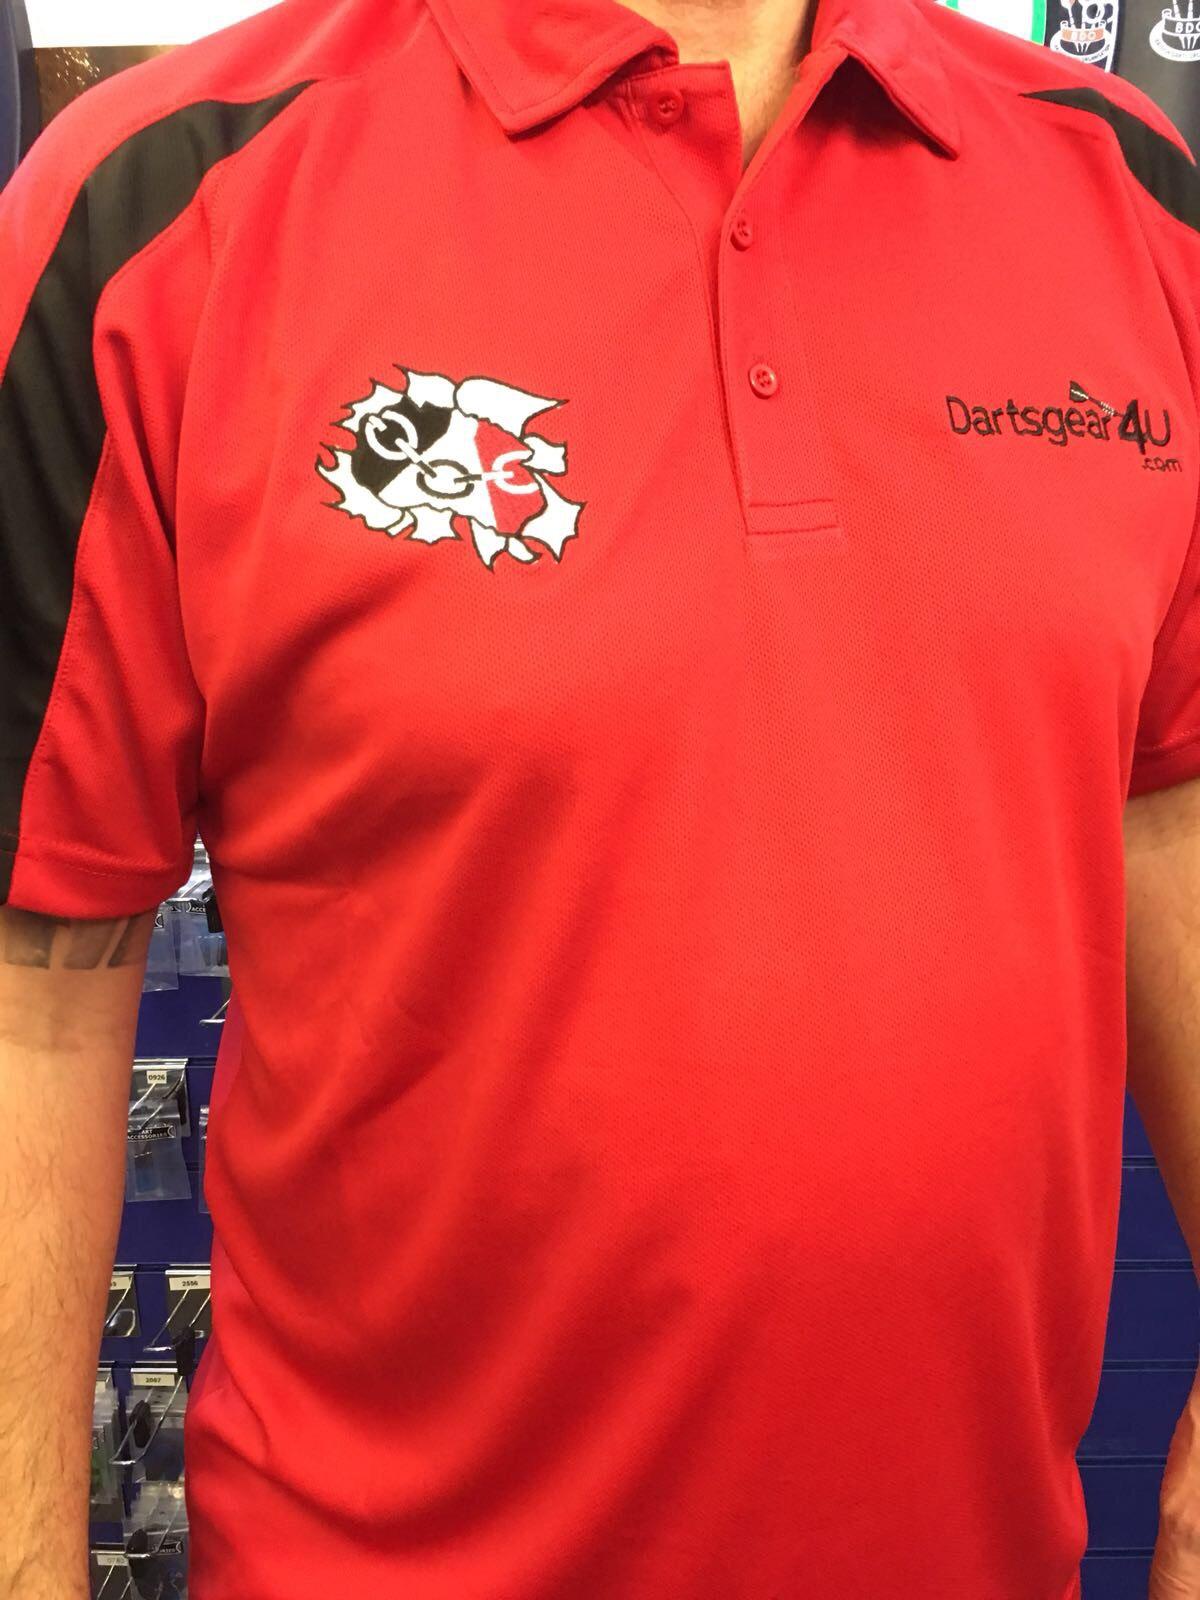 Dartsgear4u Black Country Arrow Redblack Polo Shirt Free Pp